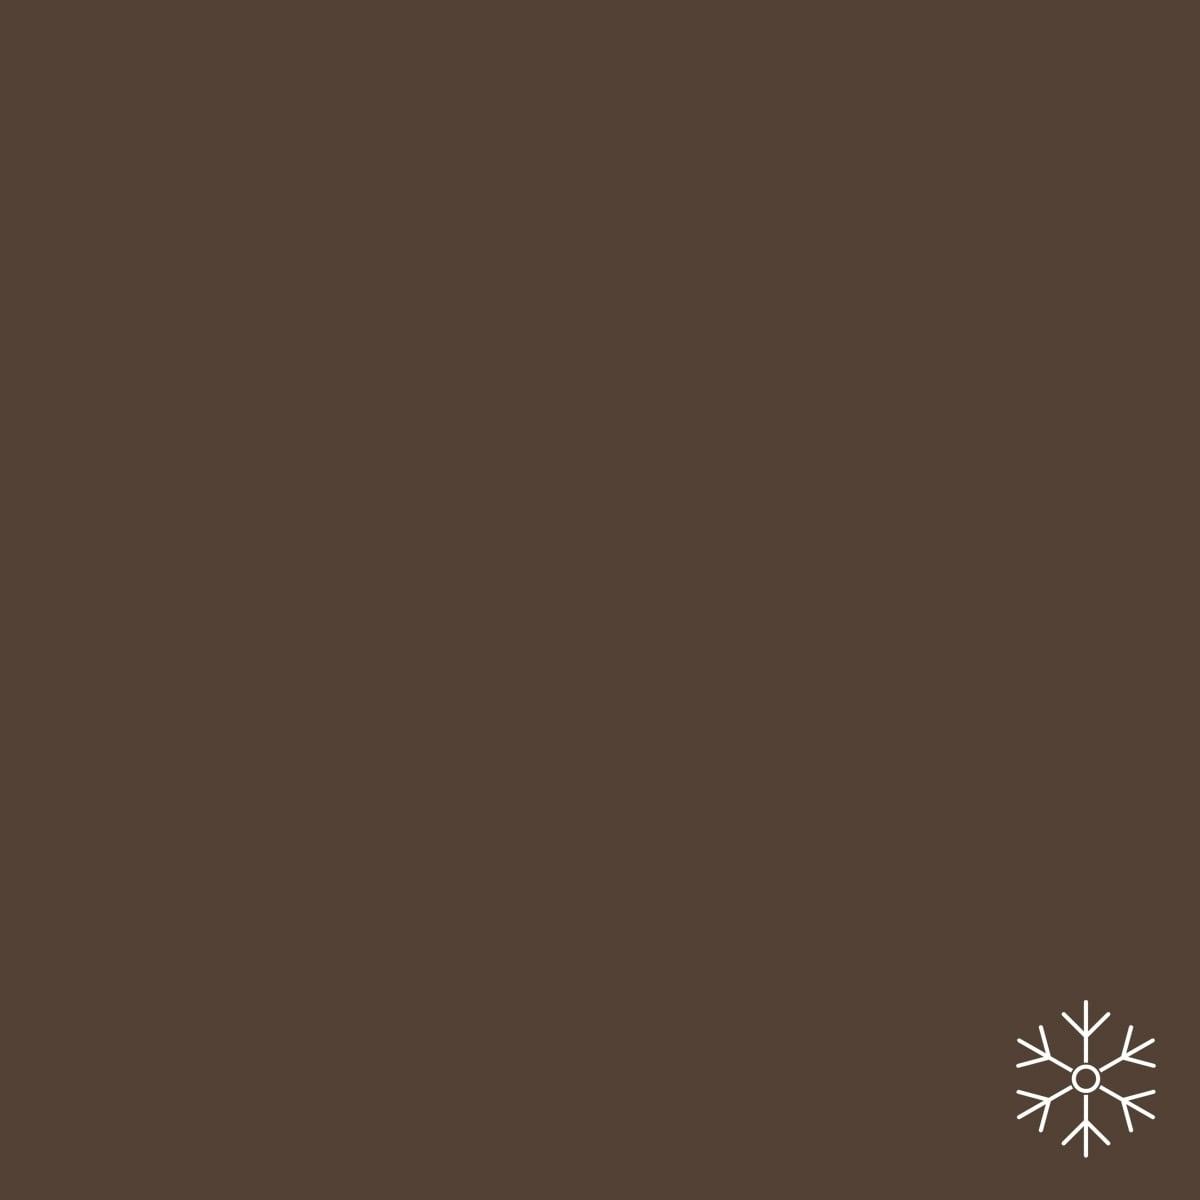 ORGANIC LINE  - PIGMENT DARK CHOCOLATE ORGANICLINE AMIEA